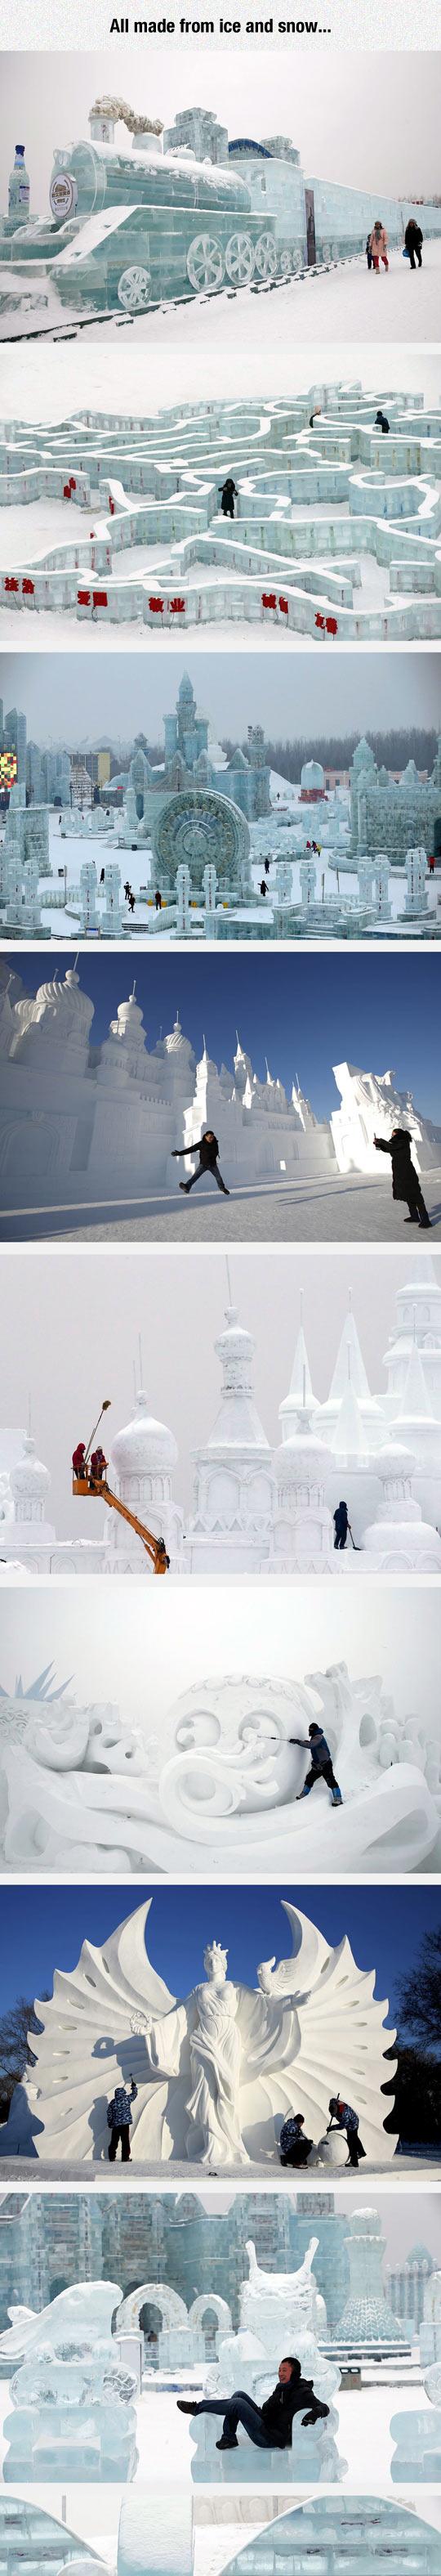 funny-ice-train-snow-winter-sculpture